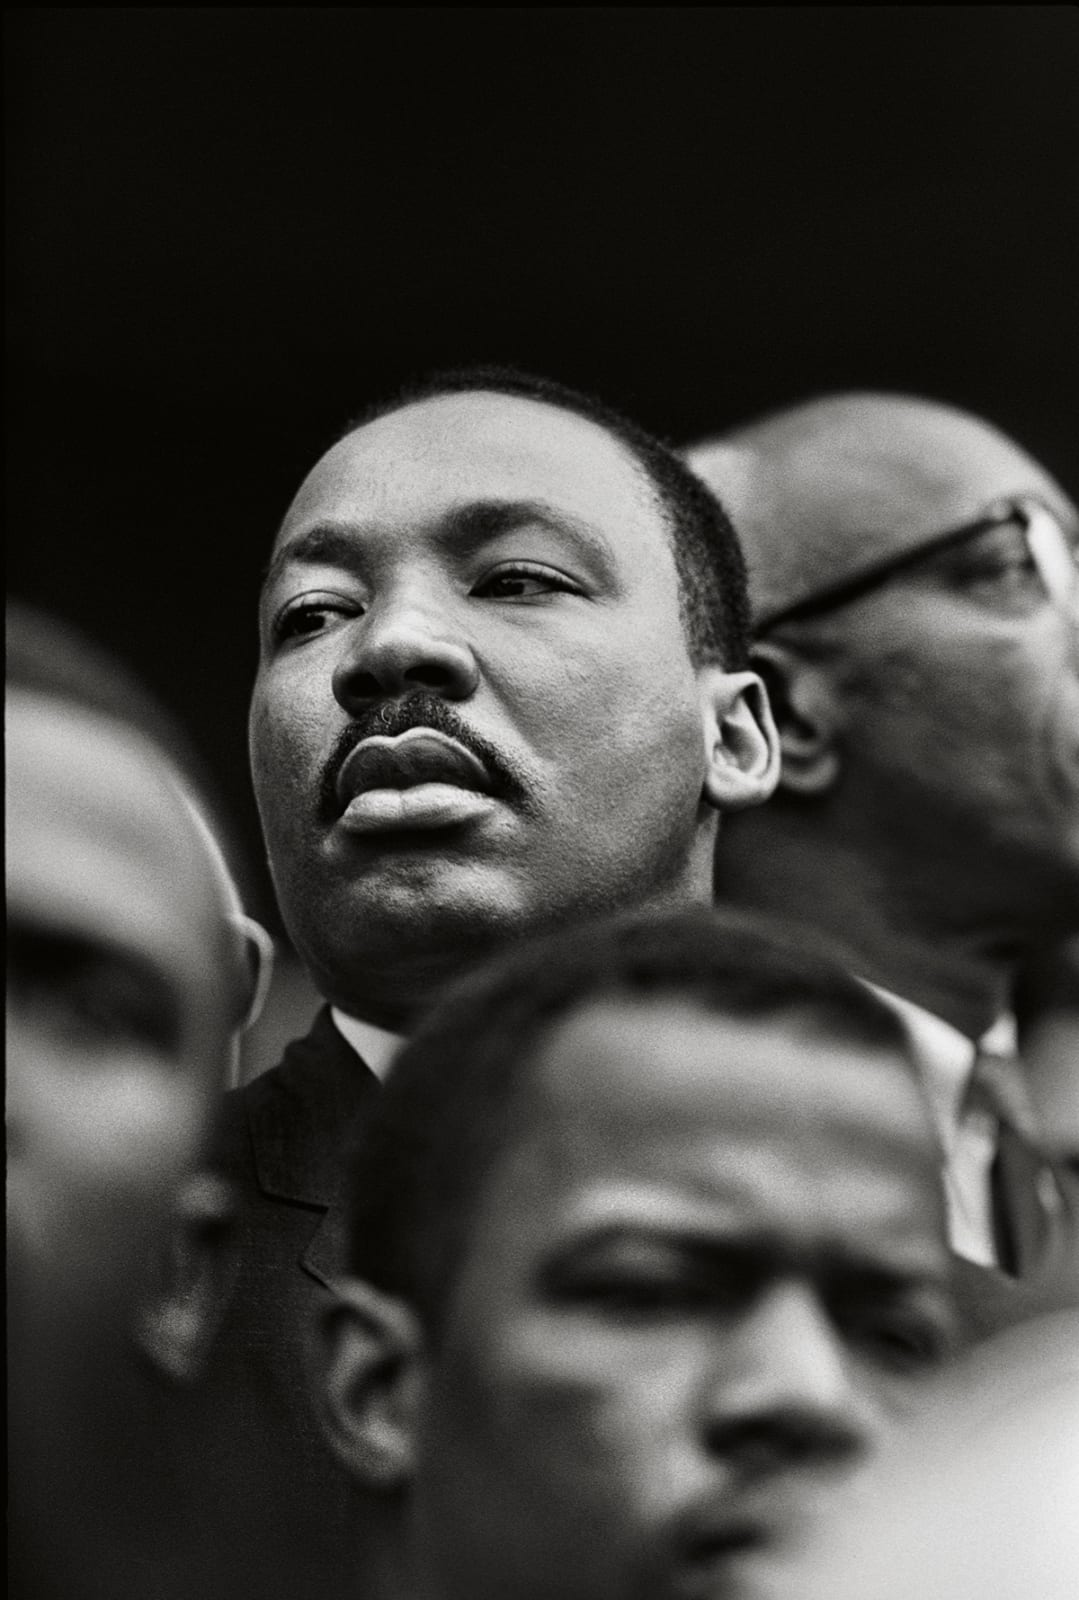 Steve Schapiro Martin Luther King Jr., Selma, 1965